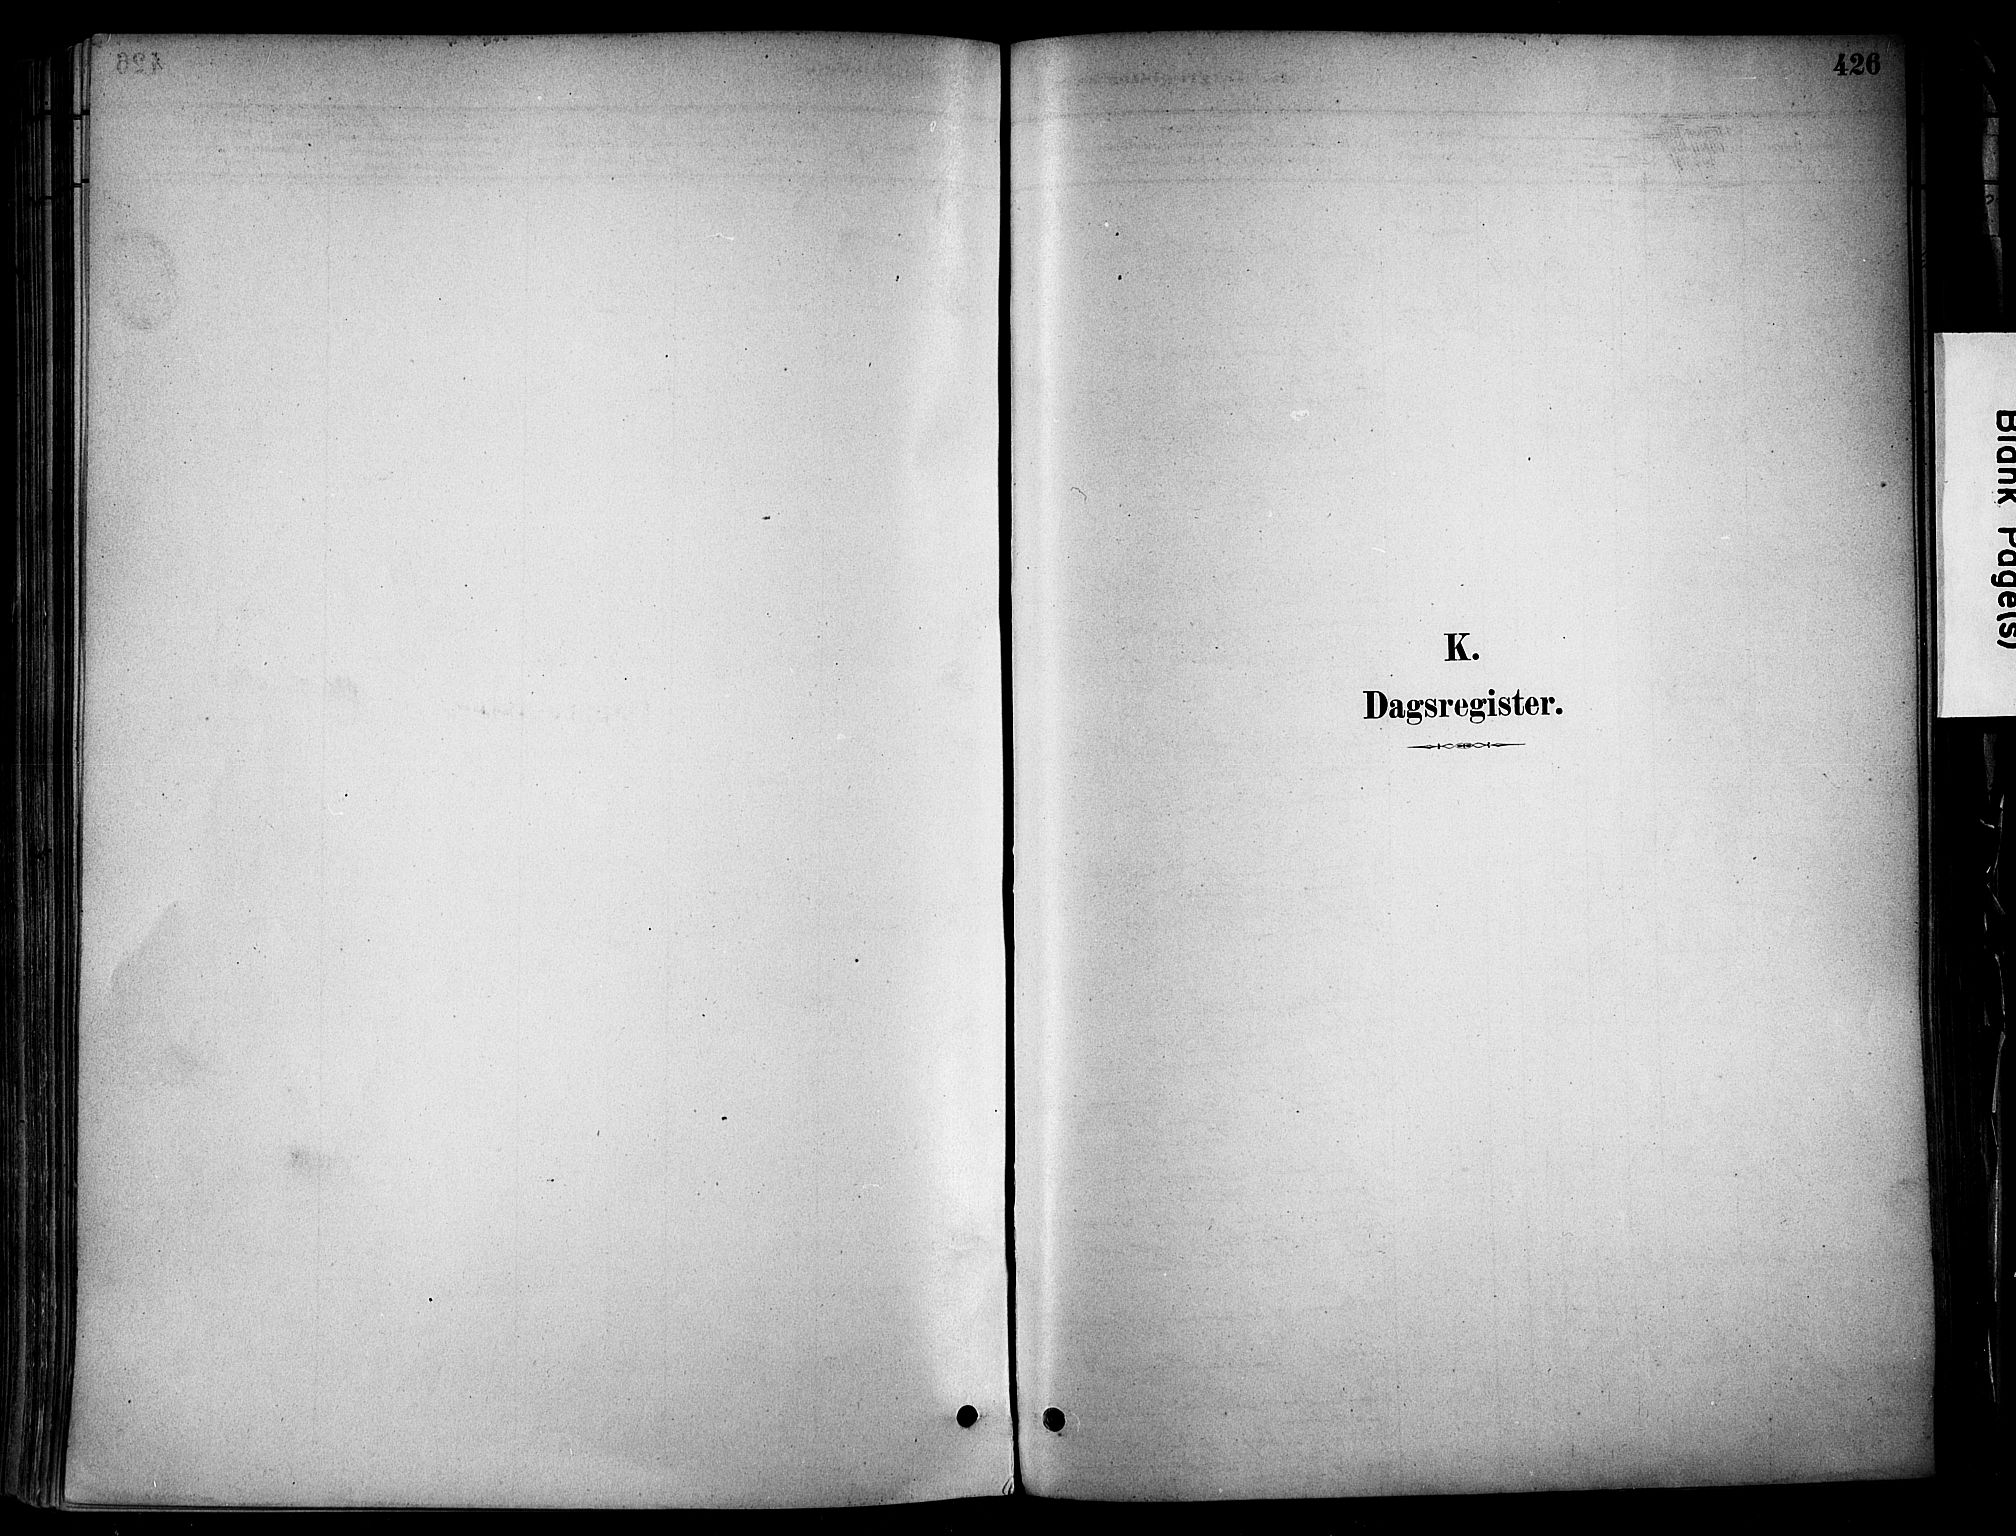 SAH, Stange prestekontor, K/L0017: Ministerialbok nr. 17, 1880-1893, s. 426